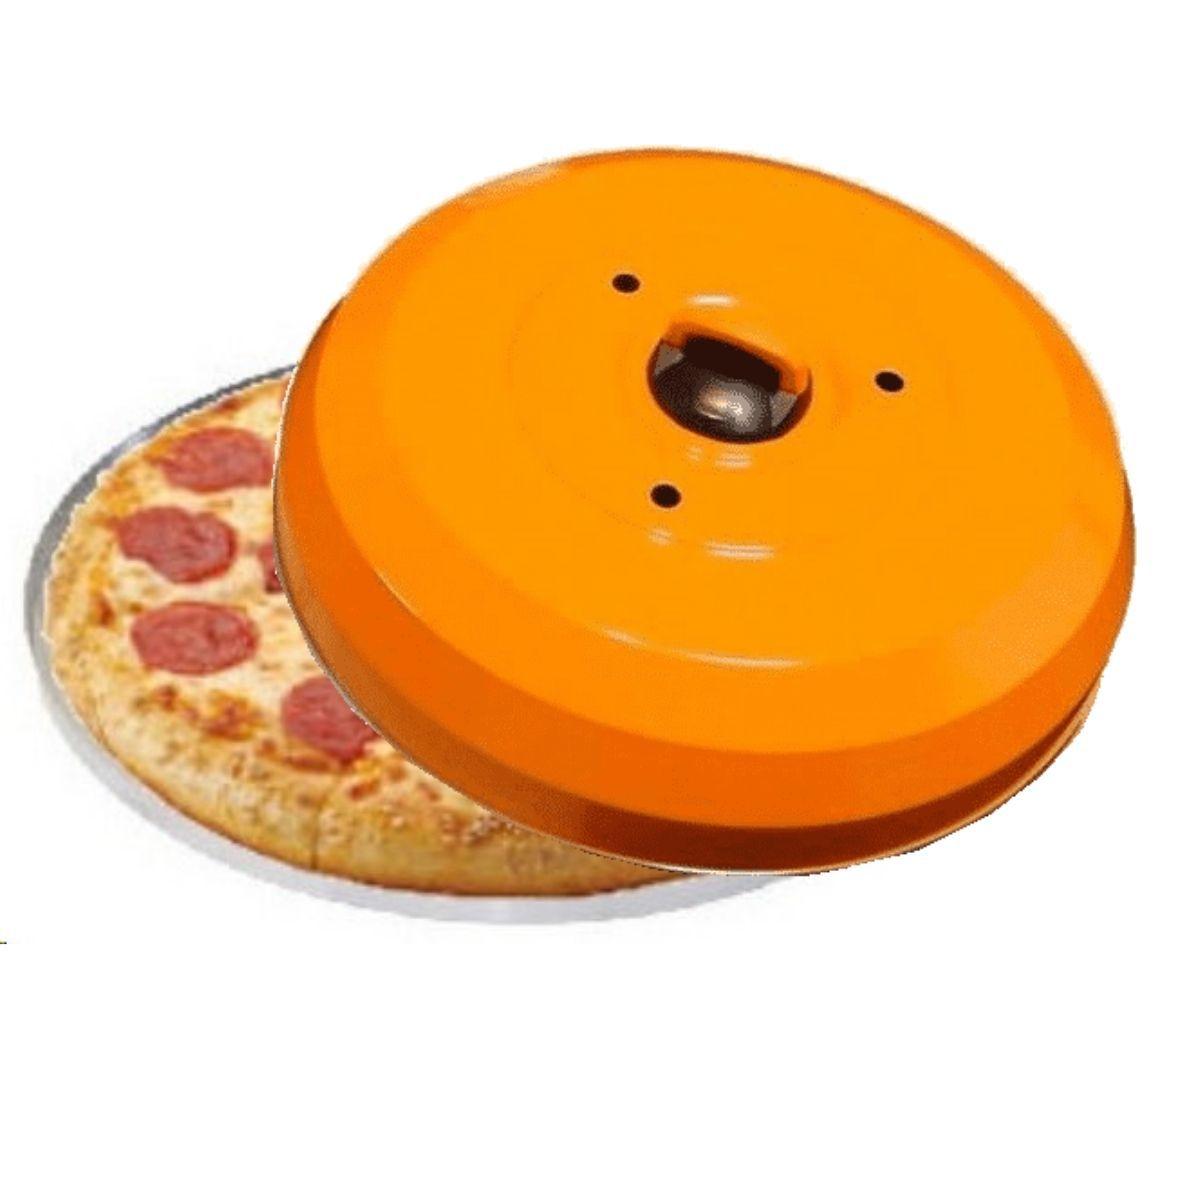 Kit Abafador De Pizza Profissional Laranja Com Forma Para Pizza 35cm